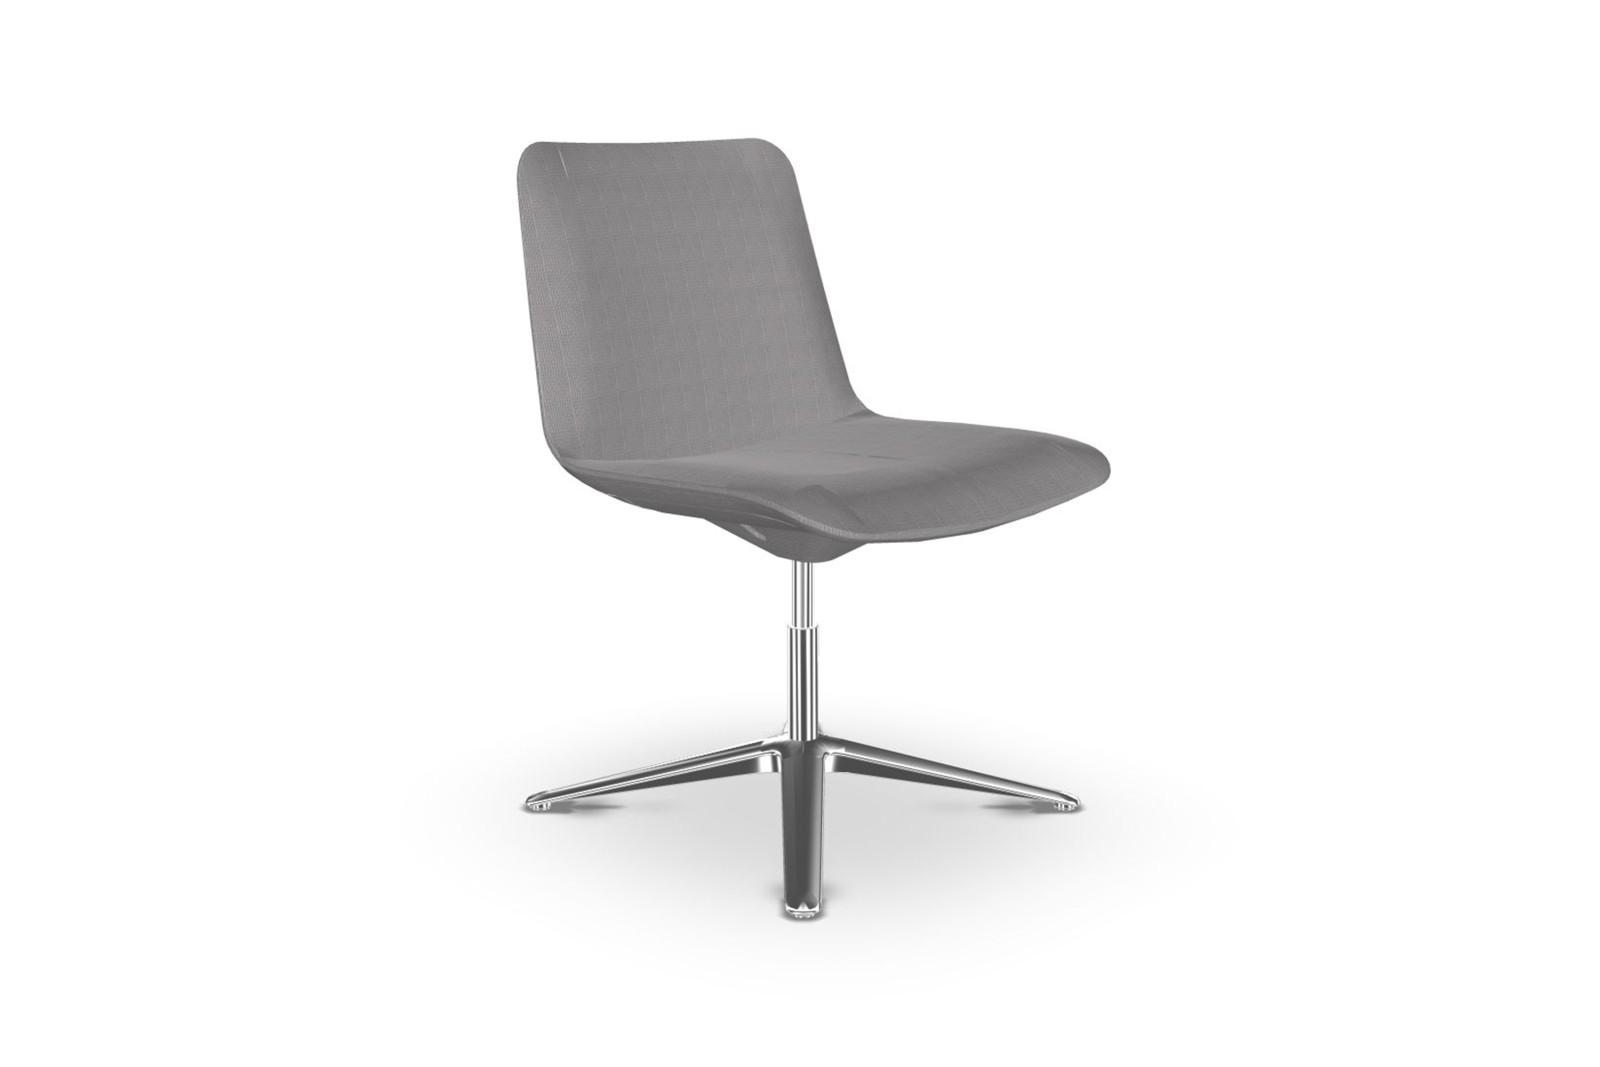 Slim Conference Low 4 805 Chair Chromed Aluminium - CR, Camira Urban - YN094, Tilt